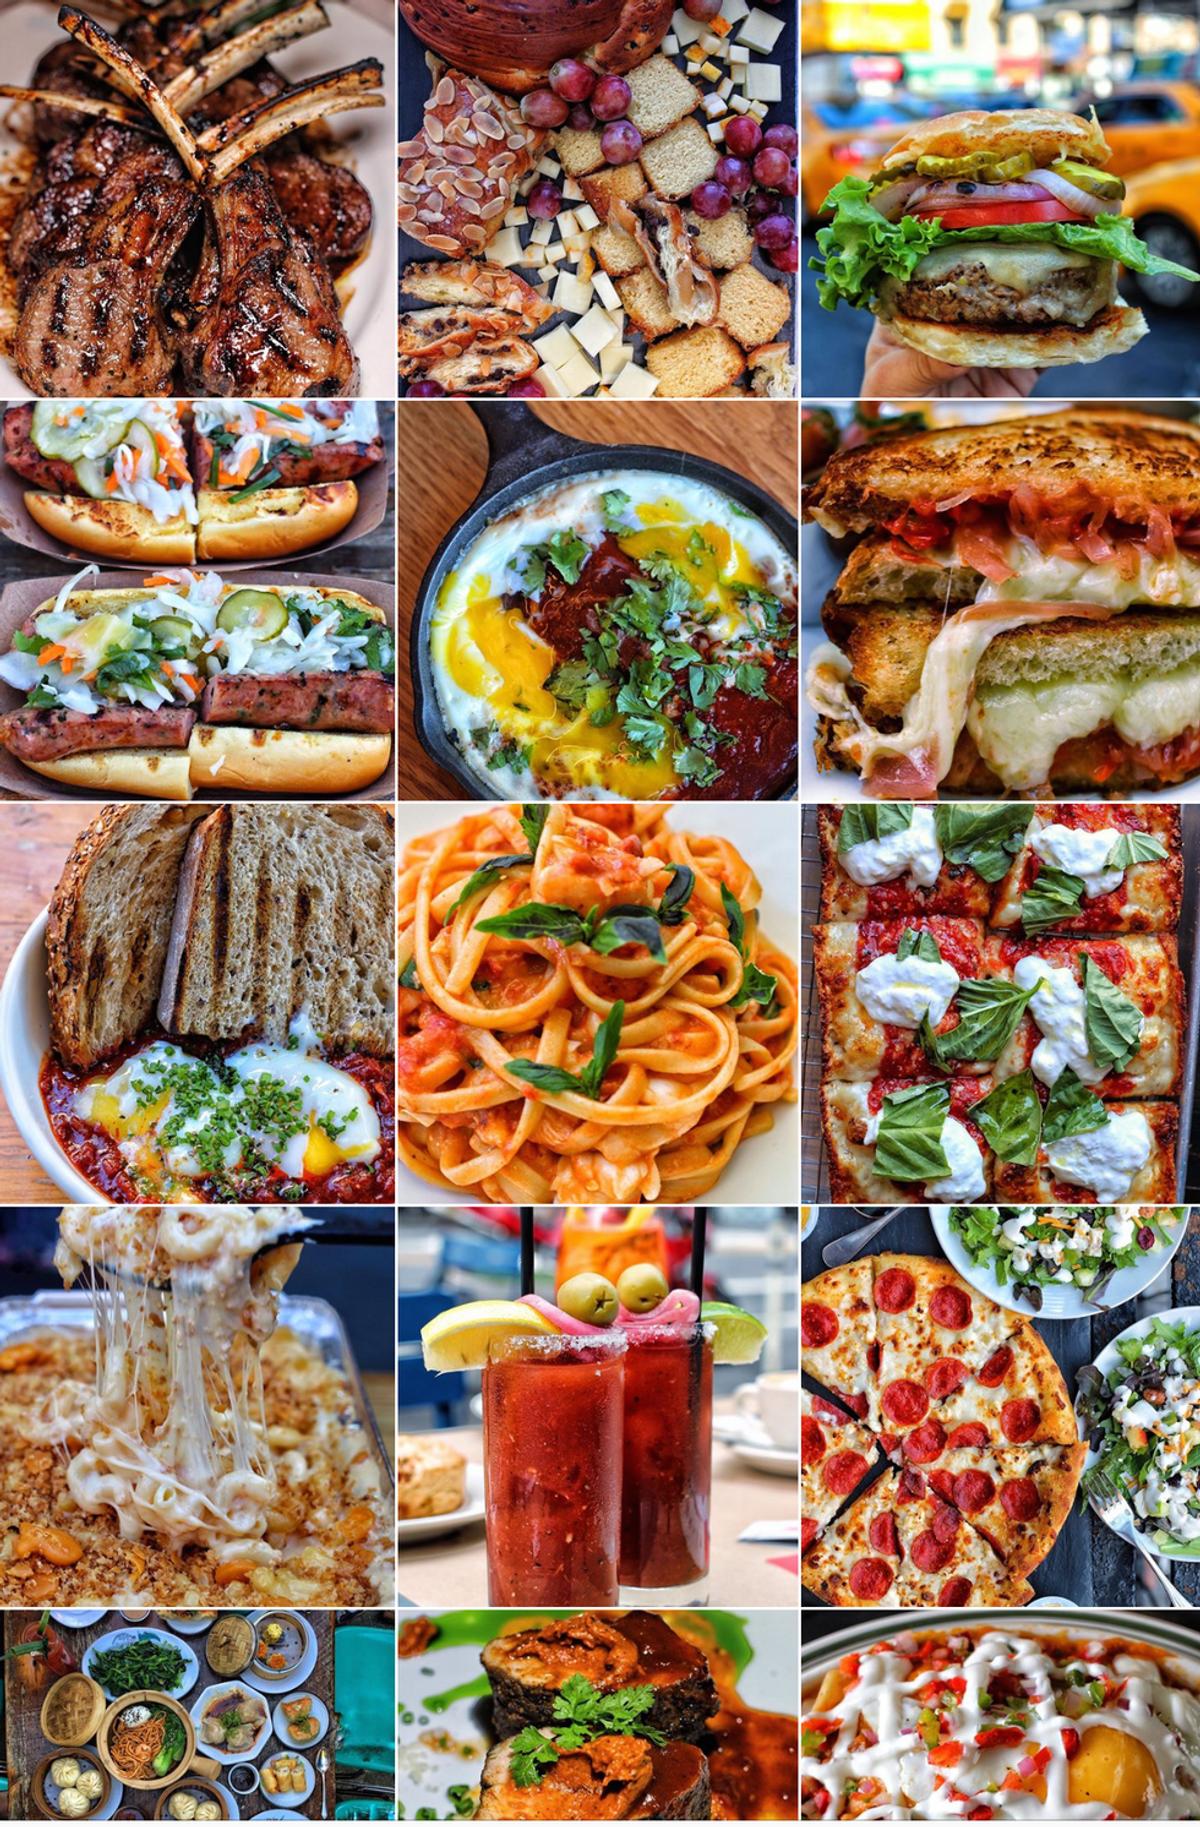 Top 5 Instagram Foodies of 2016